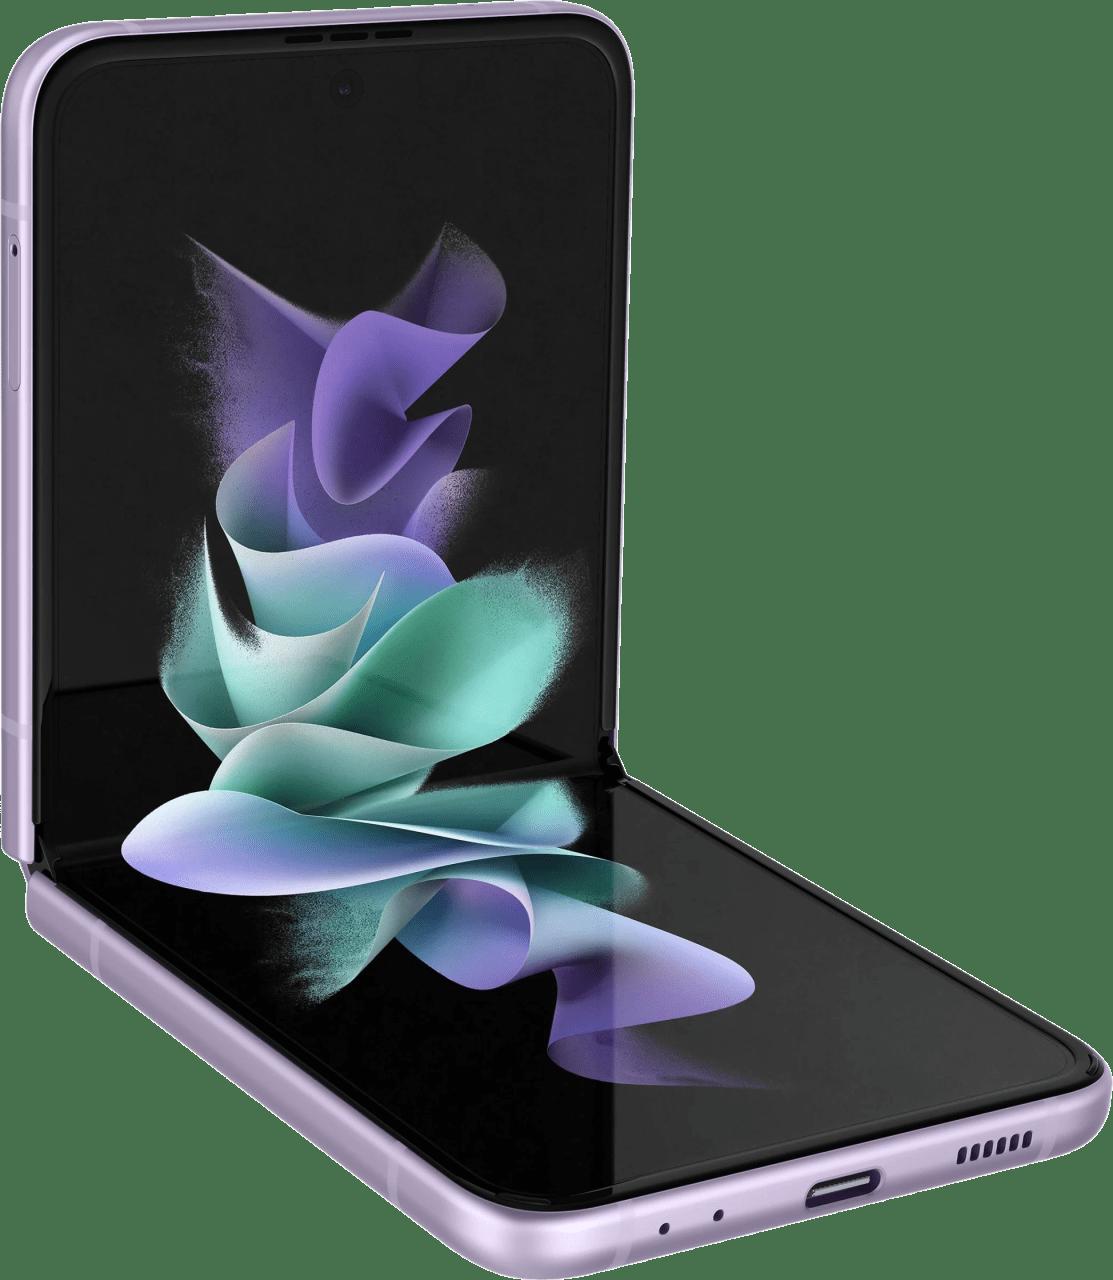 Lavender Samsung Smartphone Galaxy Flip 3 - 128GB - Single Sim.3